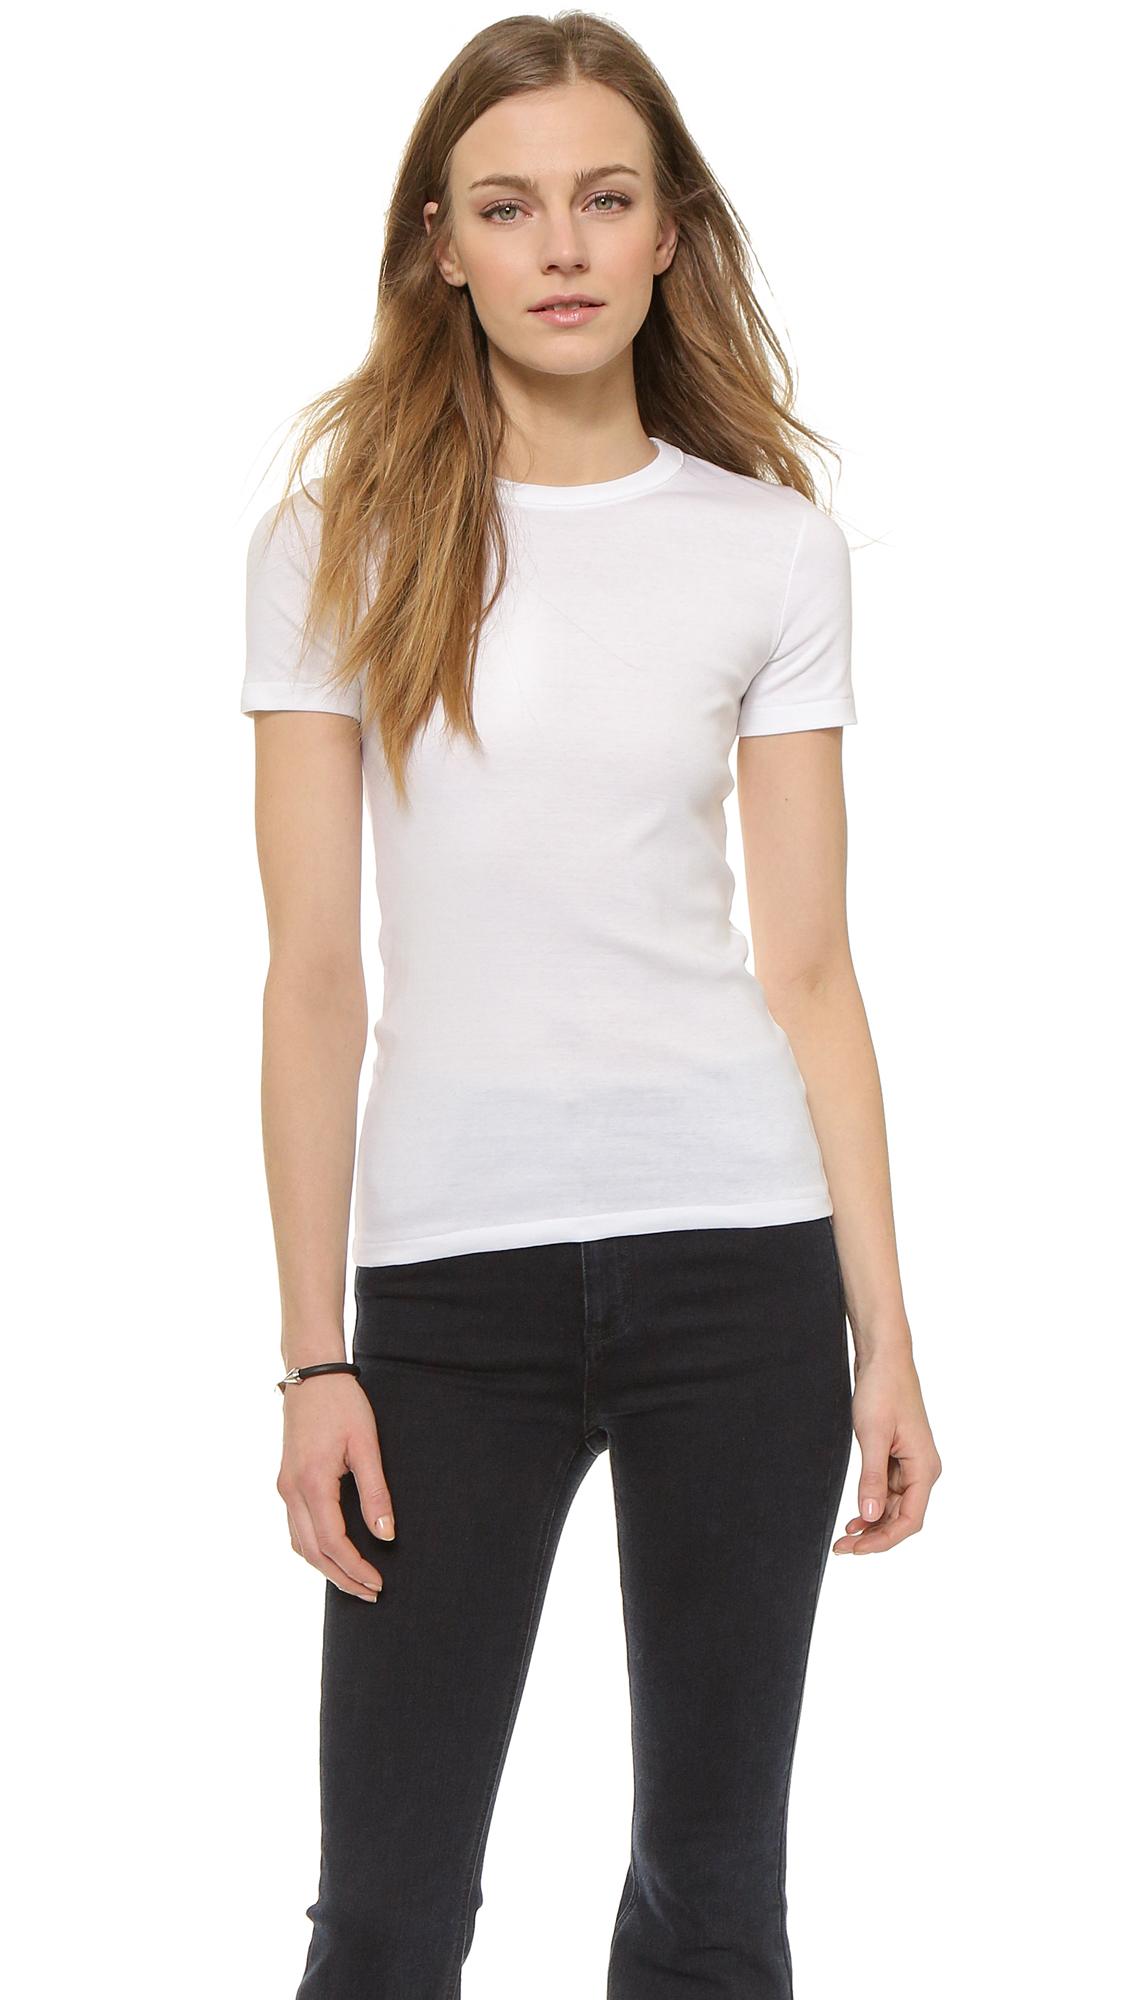 879d9eb6eae Petit Bateau Tee Shirt